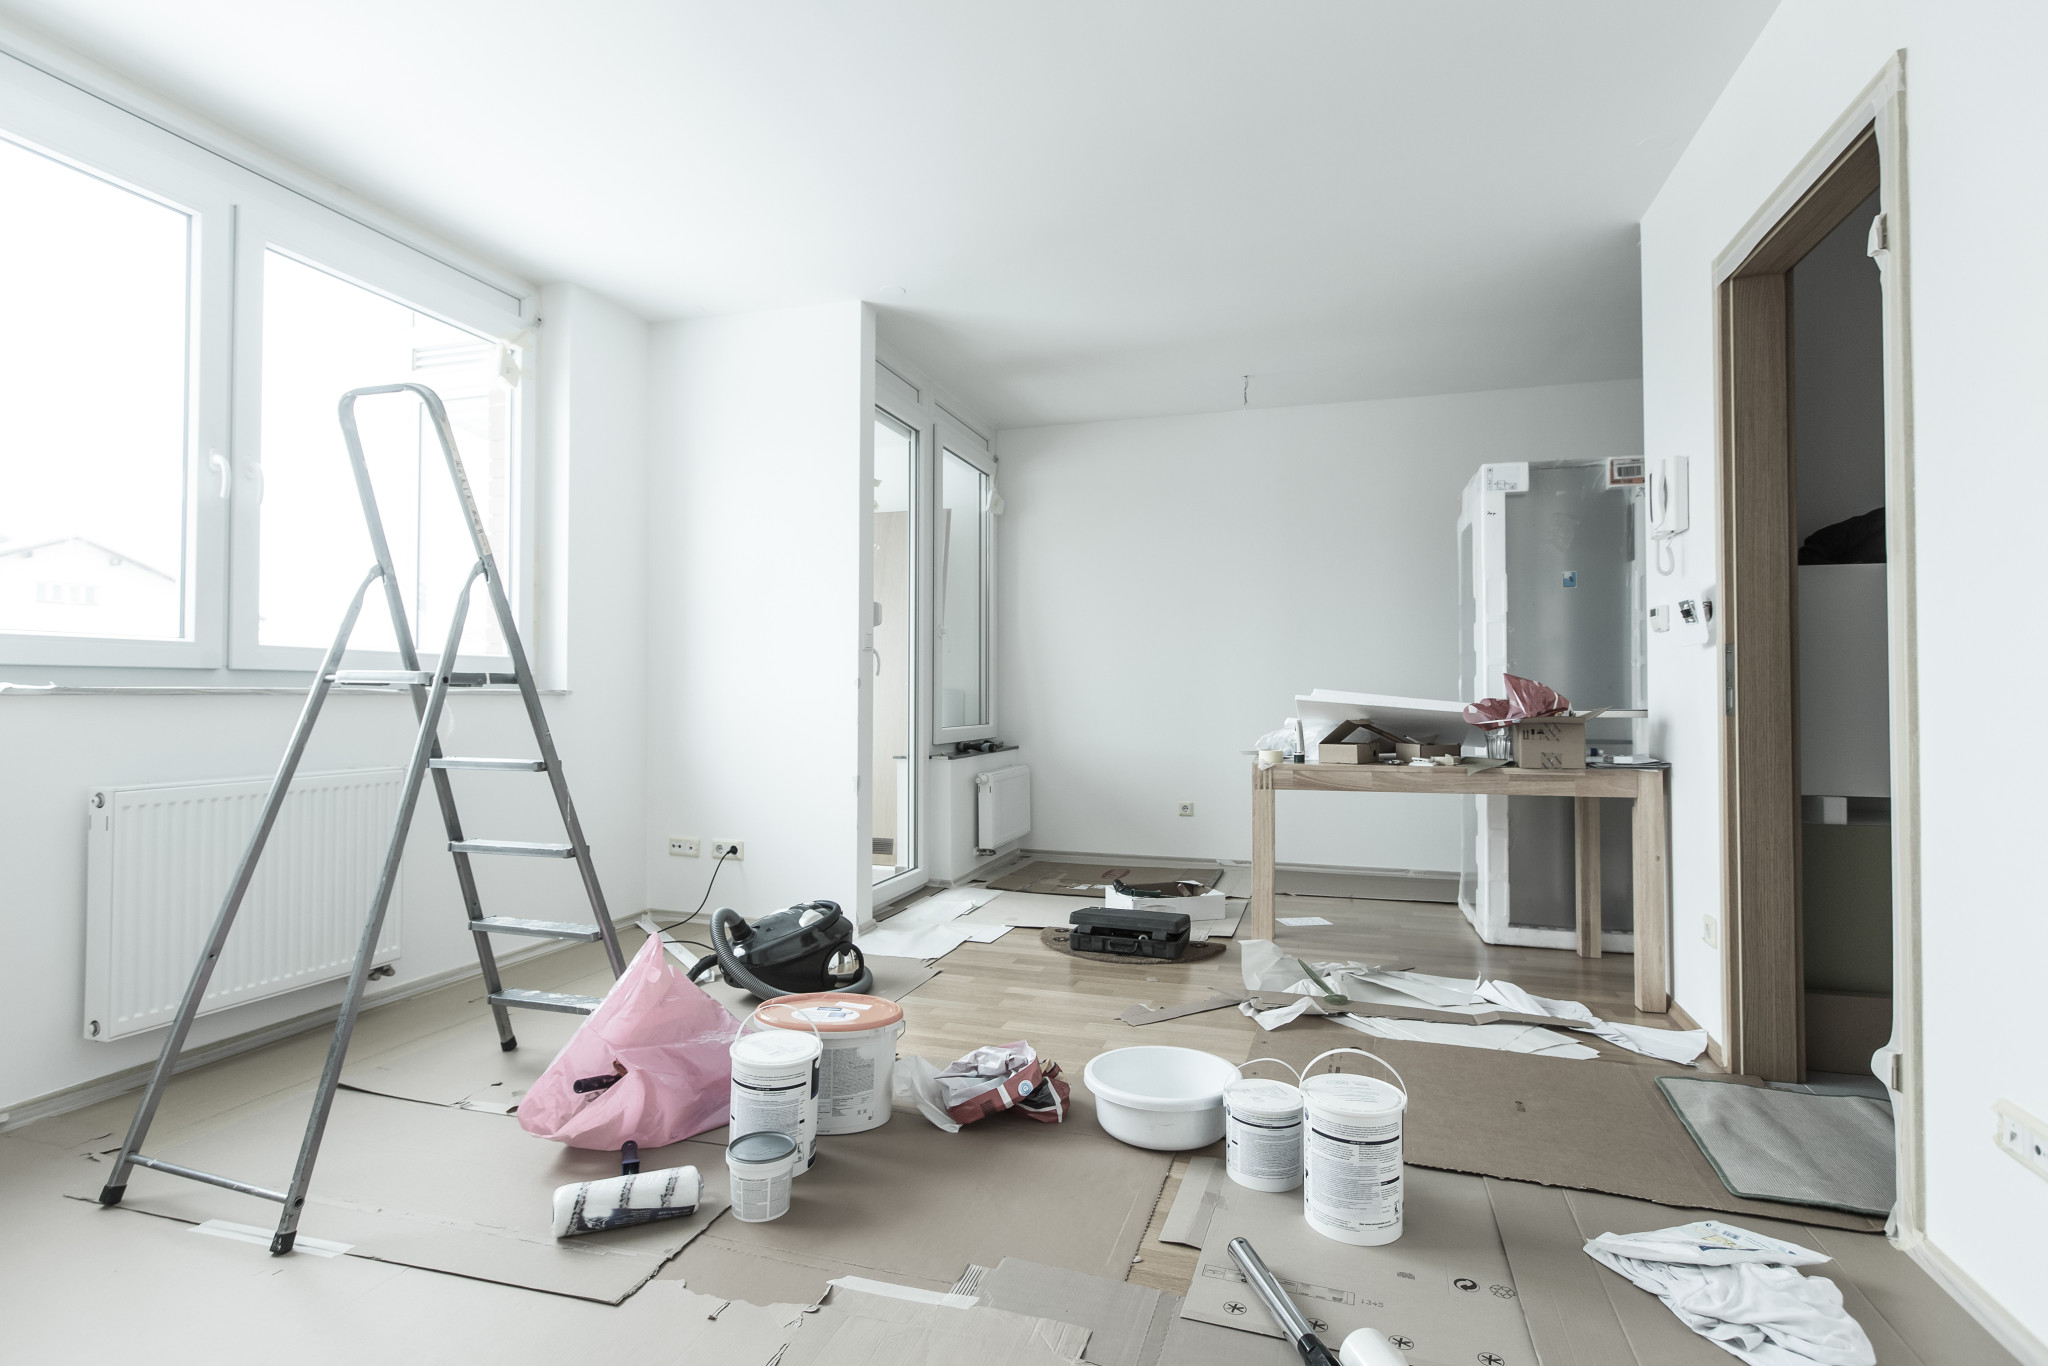 Rental Property Maintenance Landlord Or Tenant Responsibility